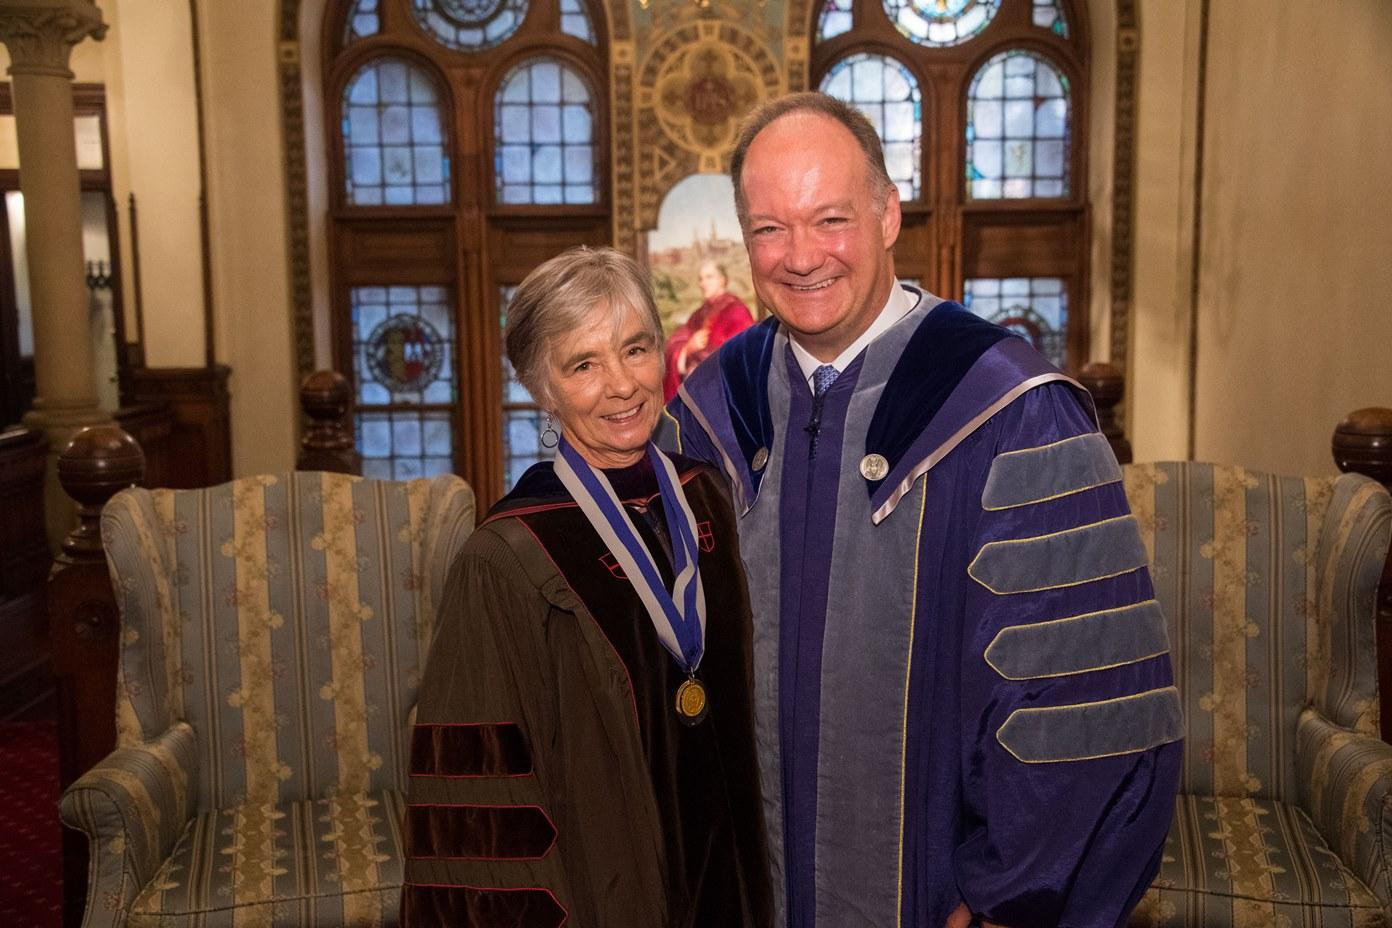 Professor Howard with President DeGioia